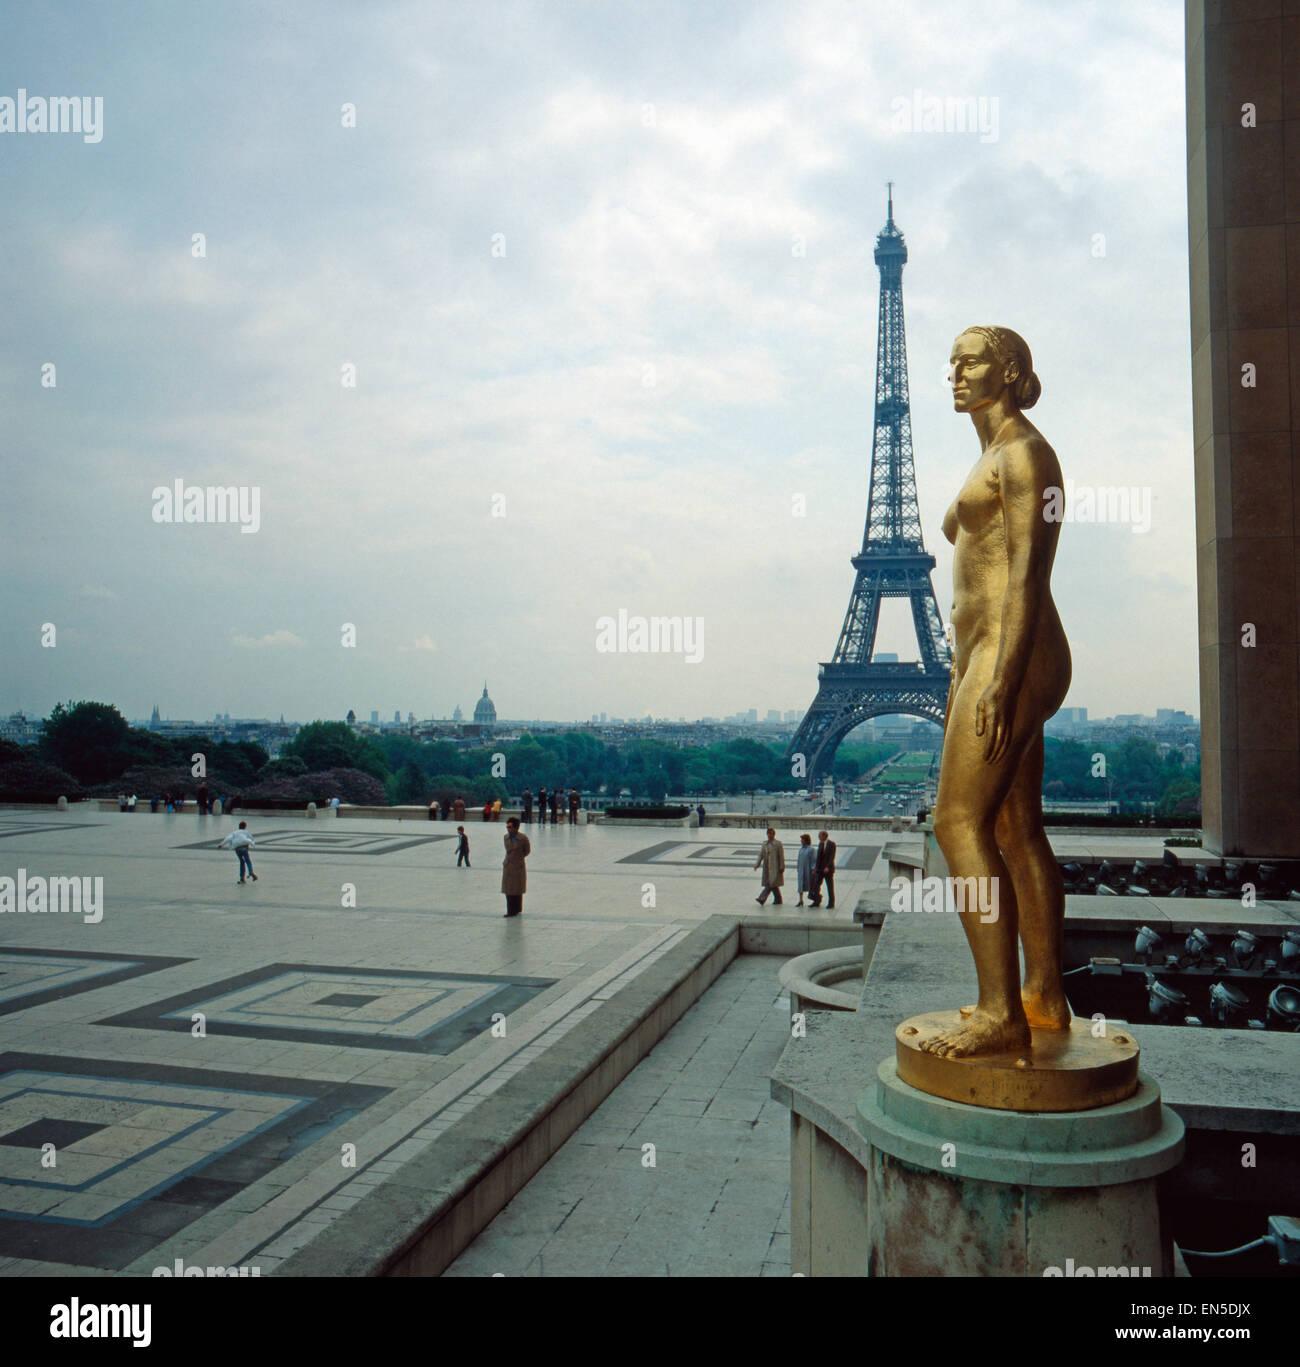 Der Eifelturm in Paris; Frankreich 1970er Jahre. The Eifel Tower in Paris; France 1970s. - Stock Image